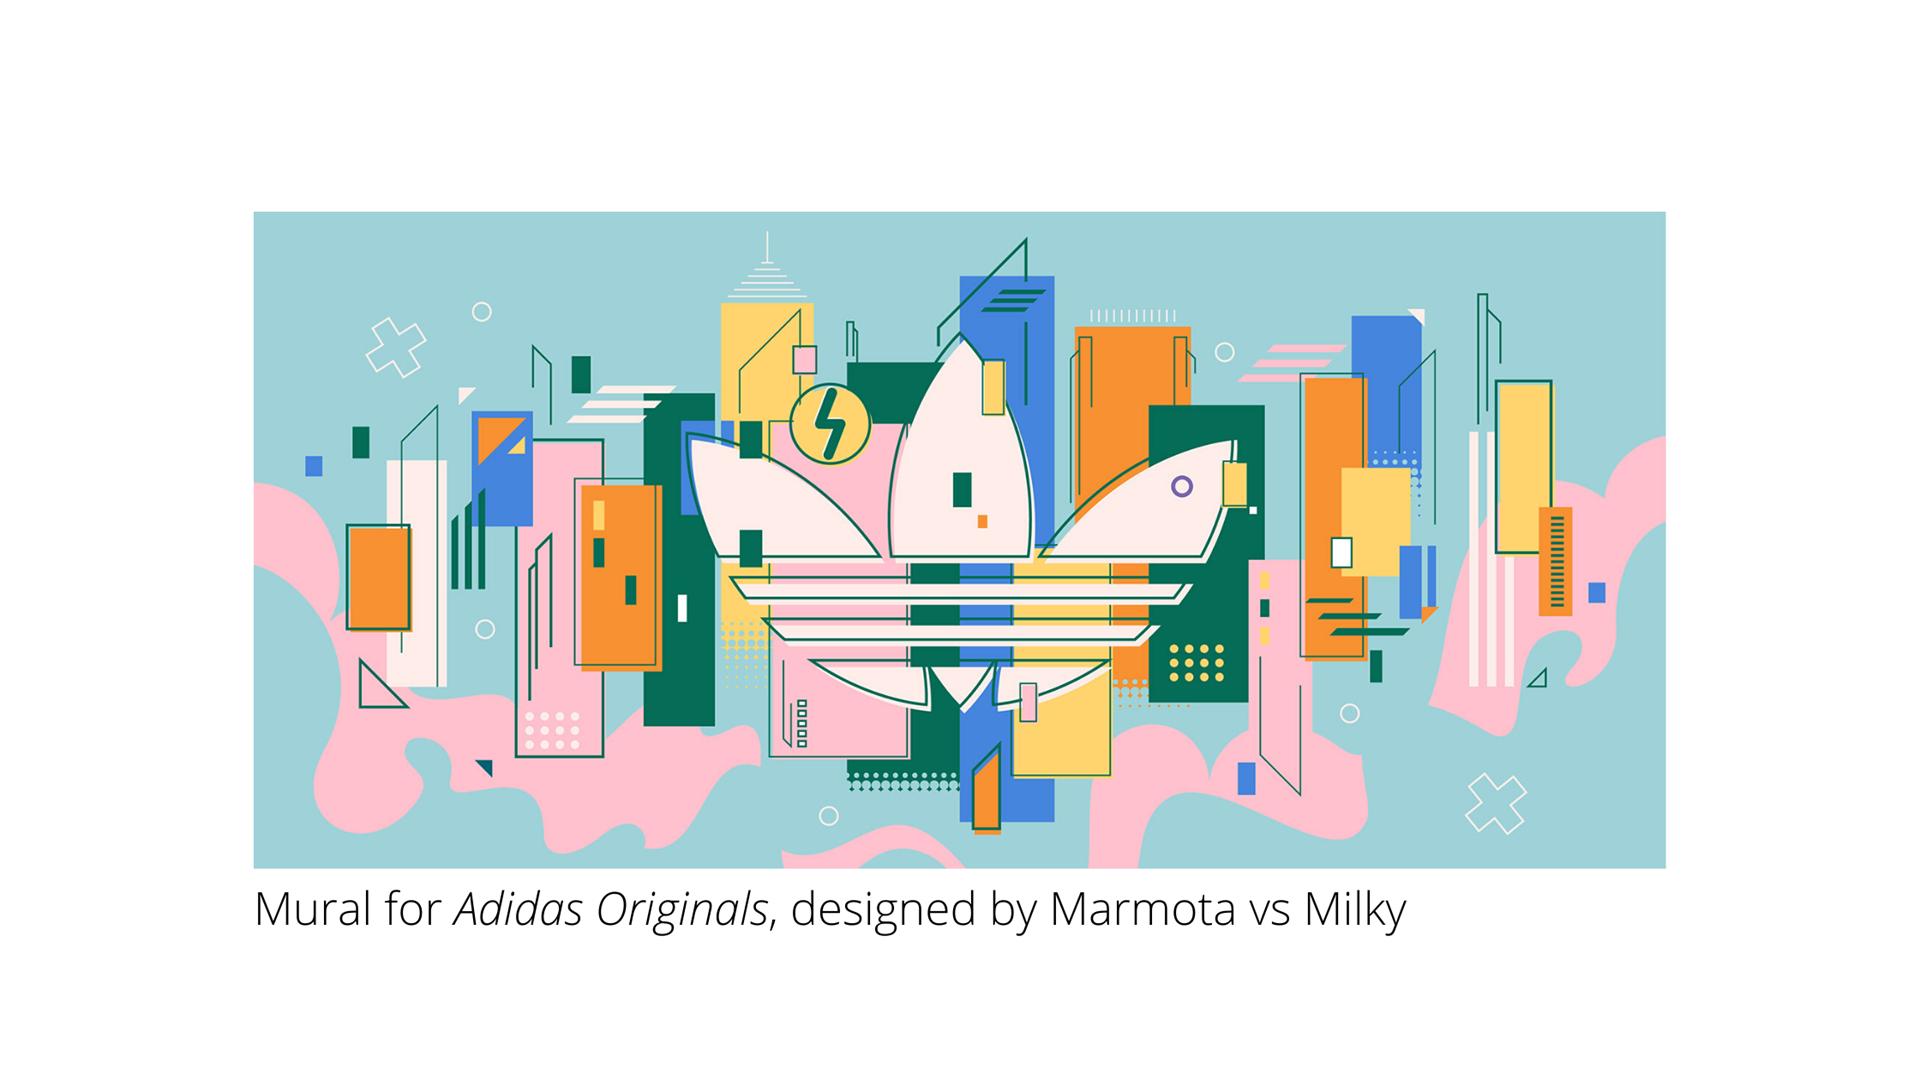 Edge summer 2020 - branding - Adidas mural